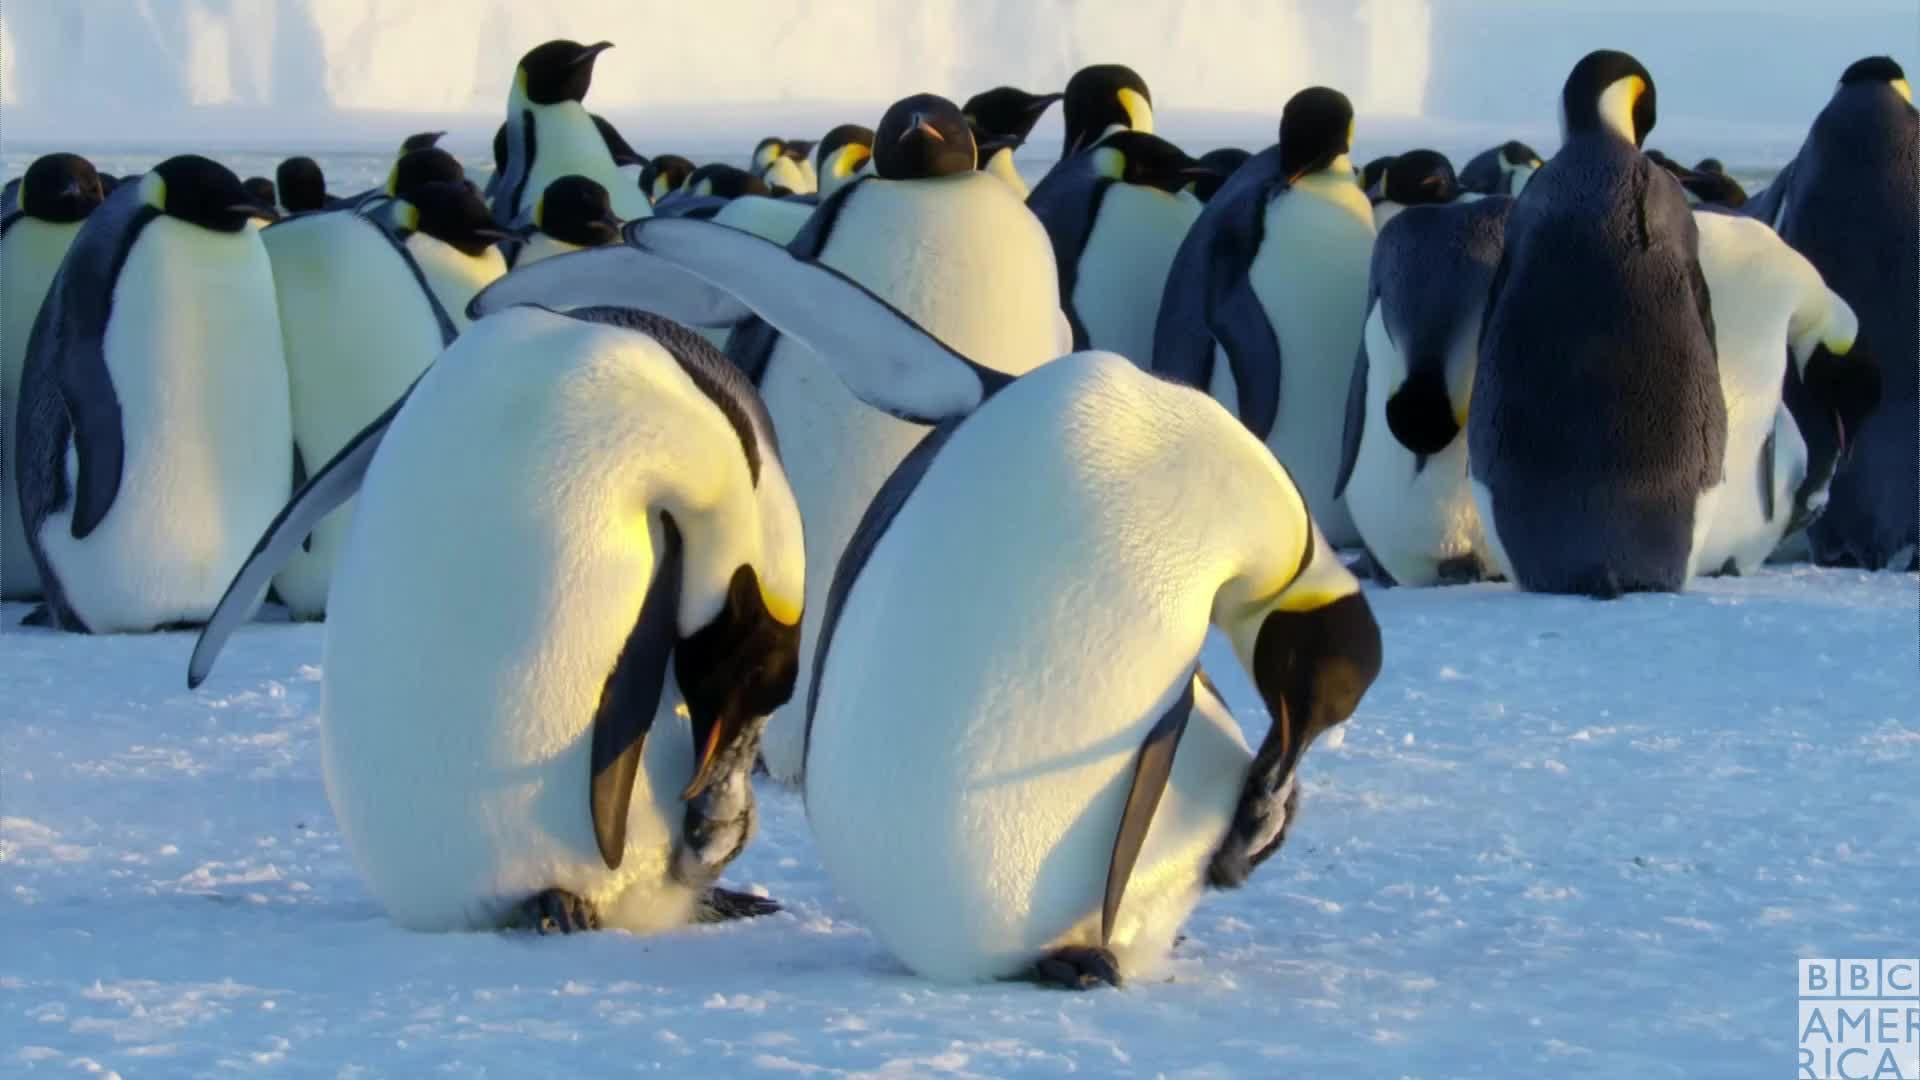 animal, animals, bbc america, bbc america dynasties, bbc america: dynasties, dynasties, emperor penguin, emperor penguins, hmmm, i don't care, i dont care, idc, lazy, meh, penguin, penguins, Dynasties Penguin Scratching GIFs